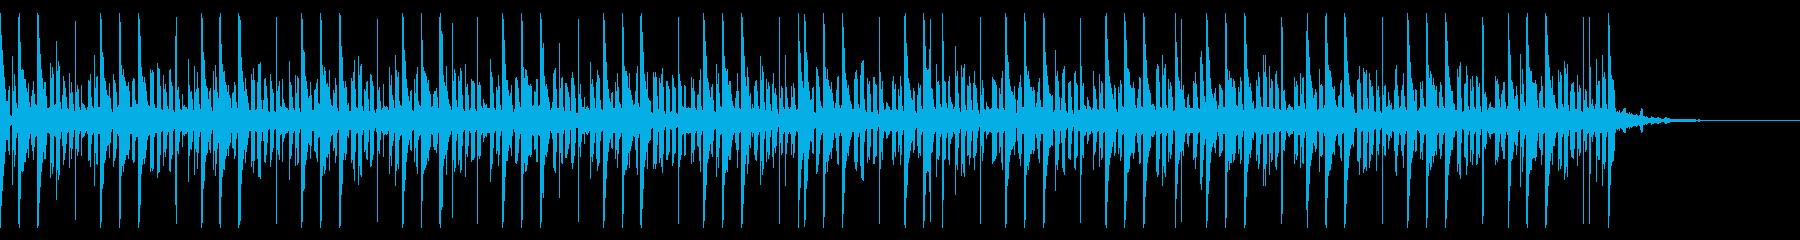 140 BPMの再生済みの波形